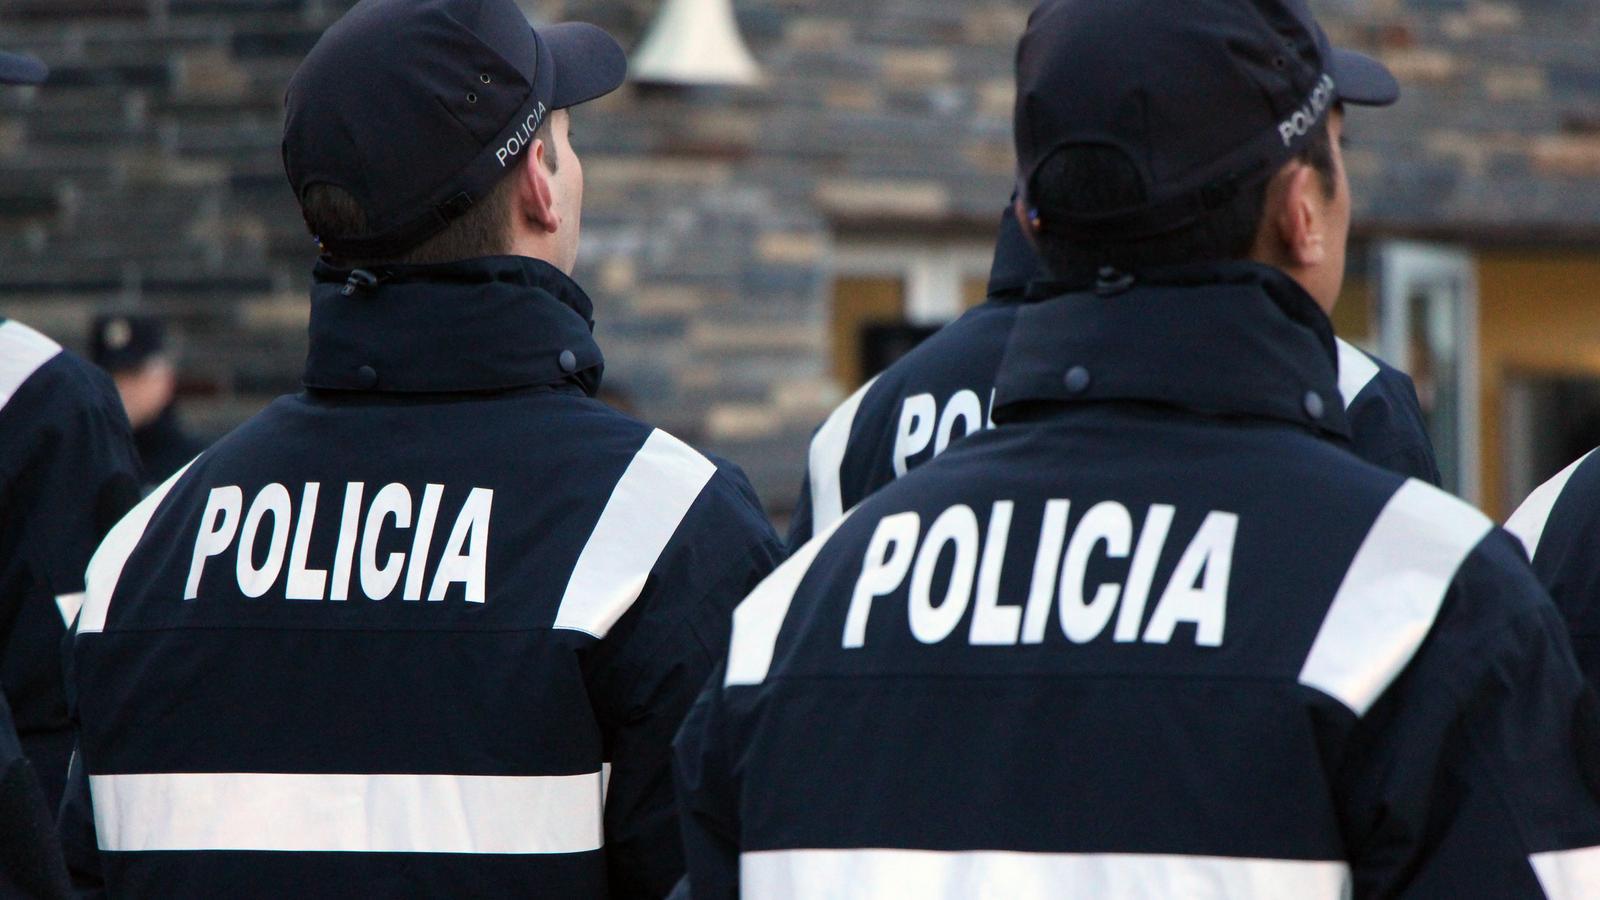 Agents del cos de Policia, en un acte recent. / C.G.